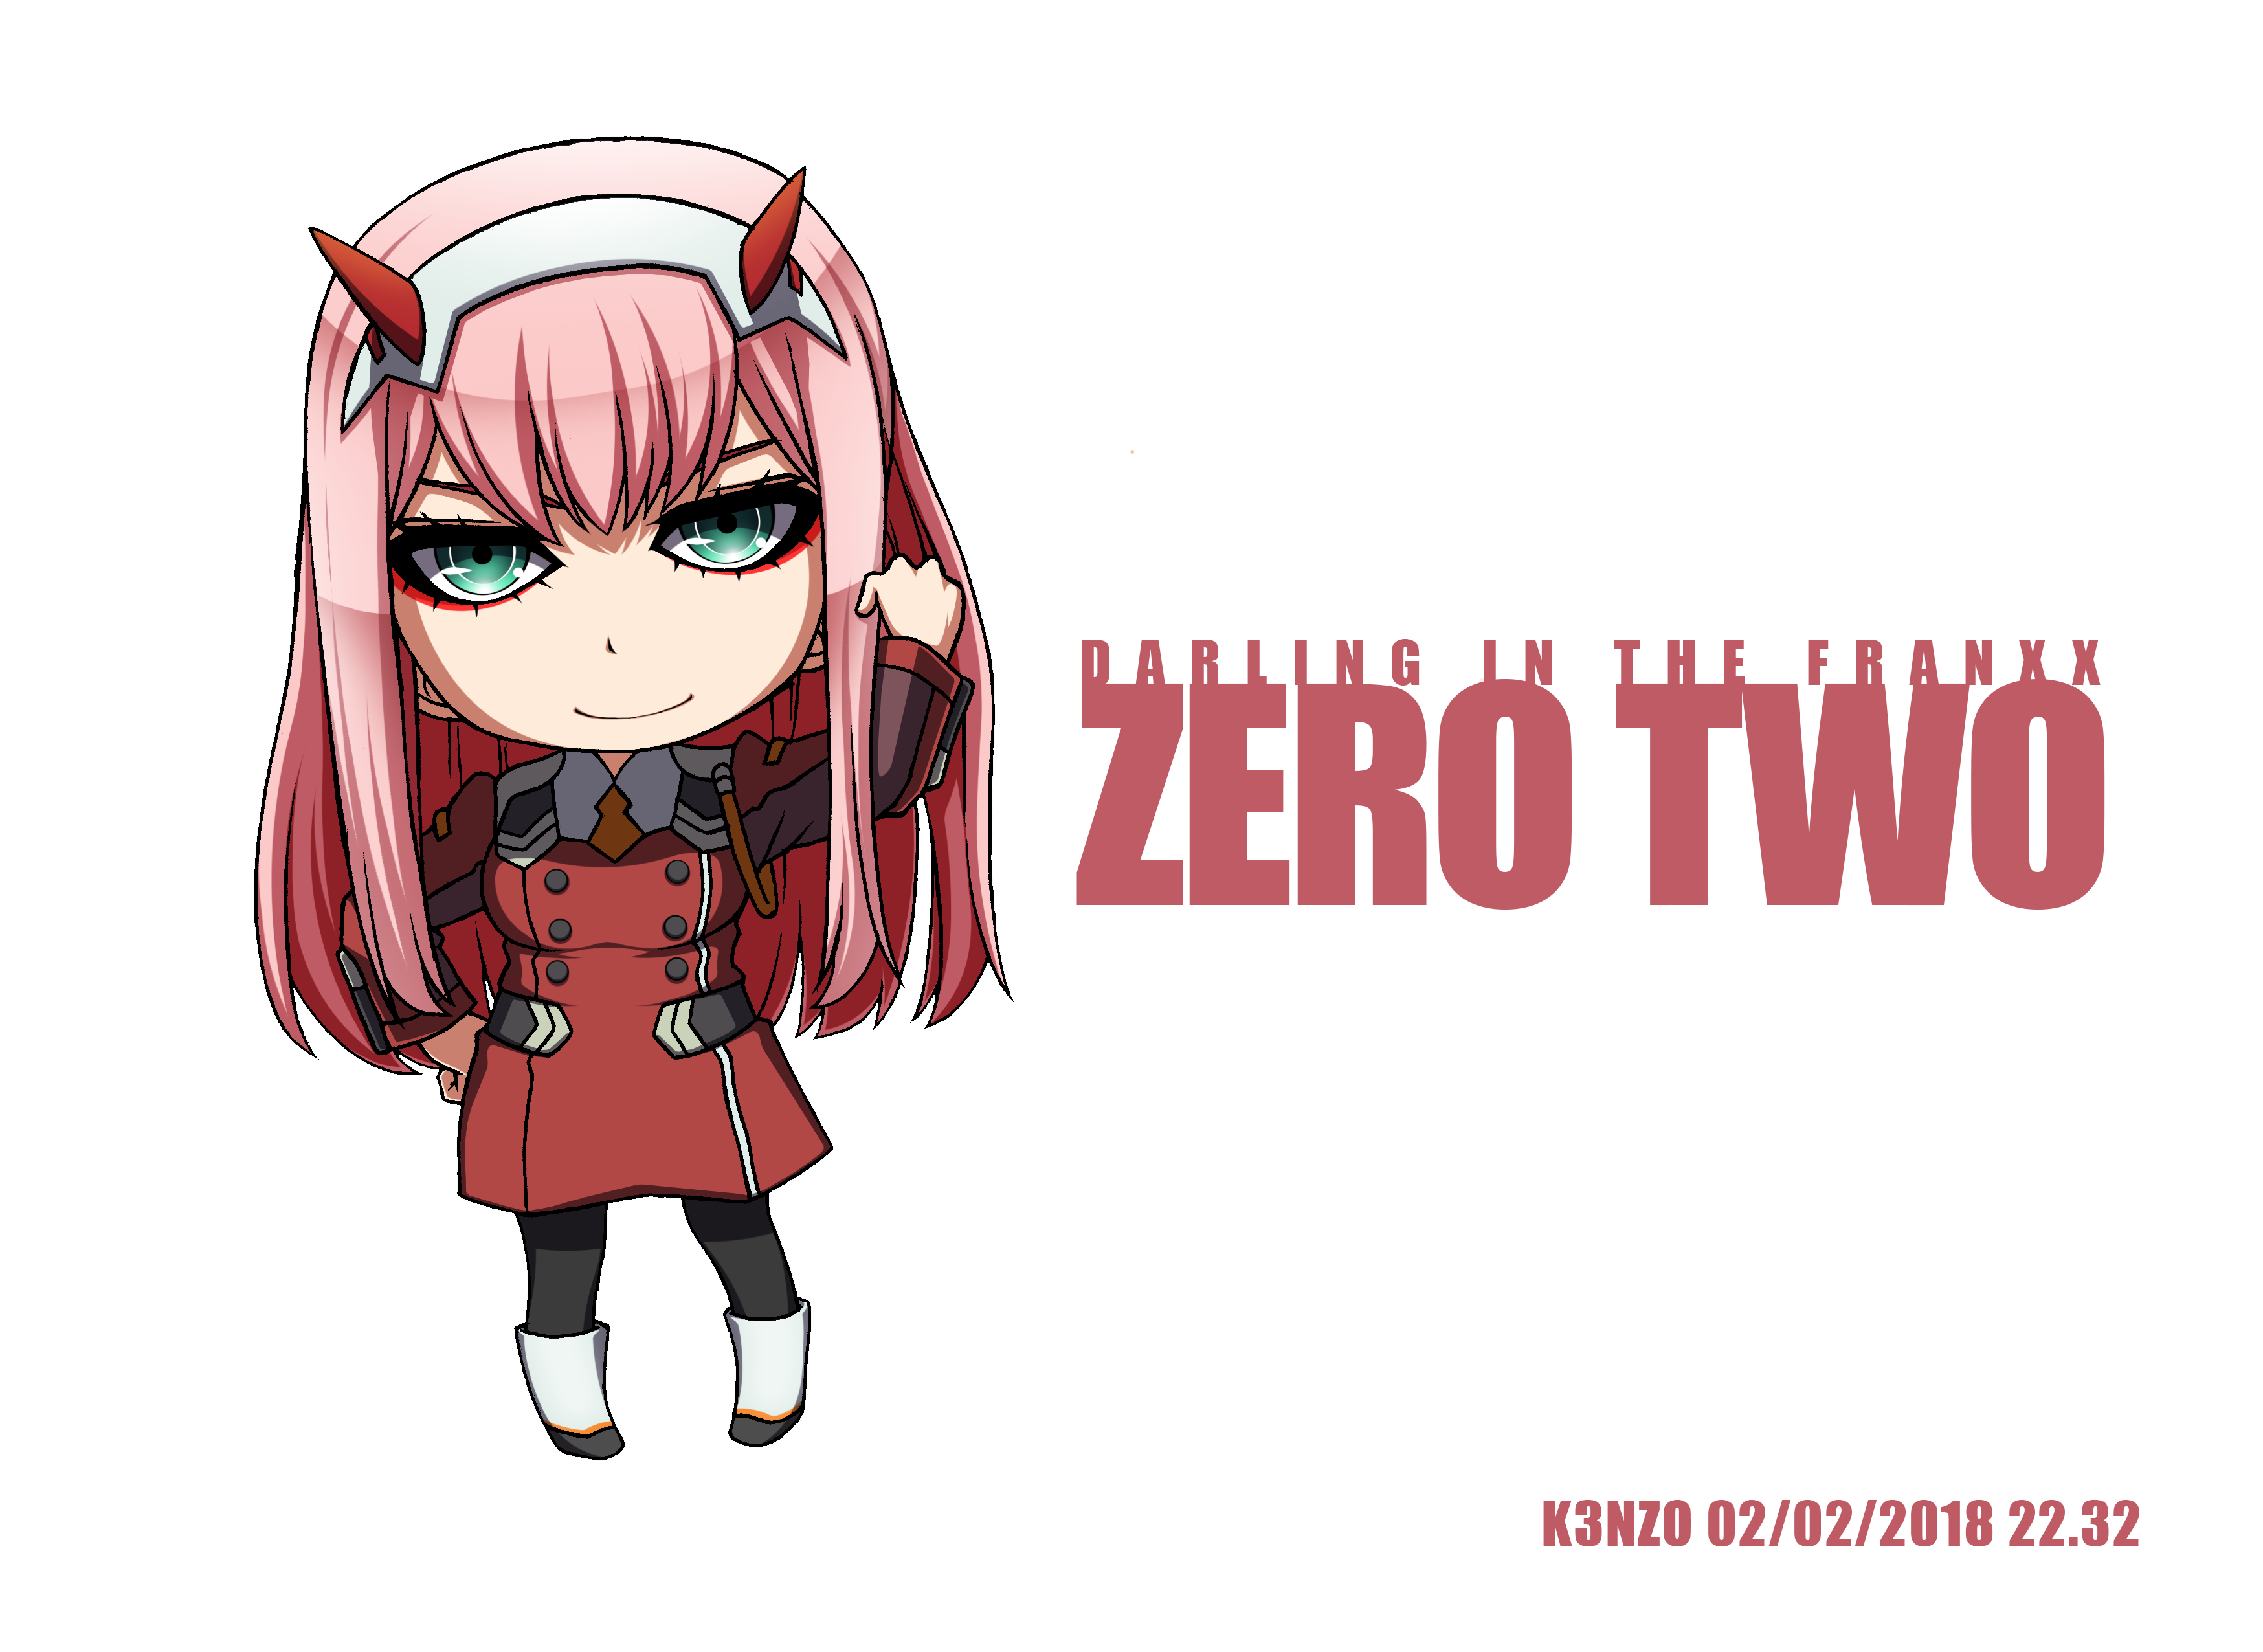 Zero Two (Darling In The FranXX) Image #2261875